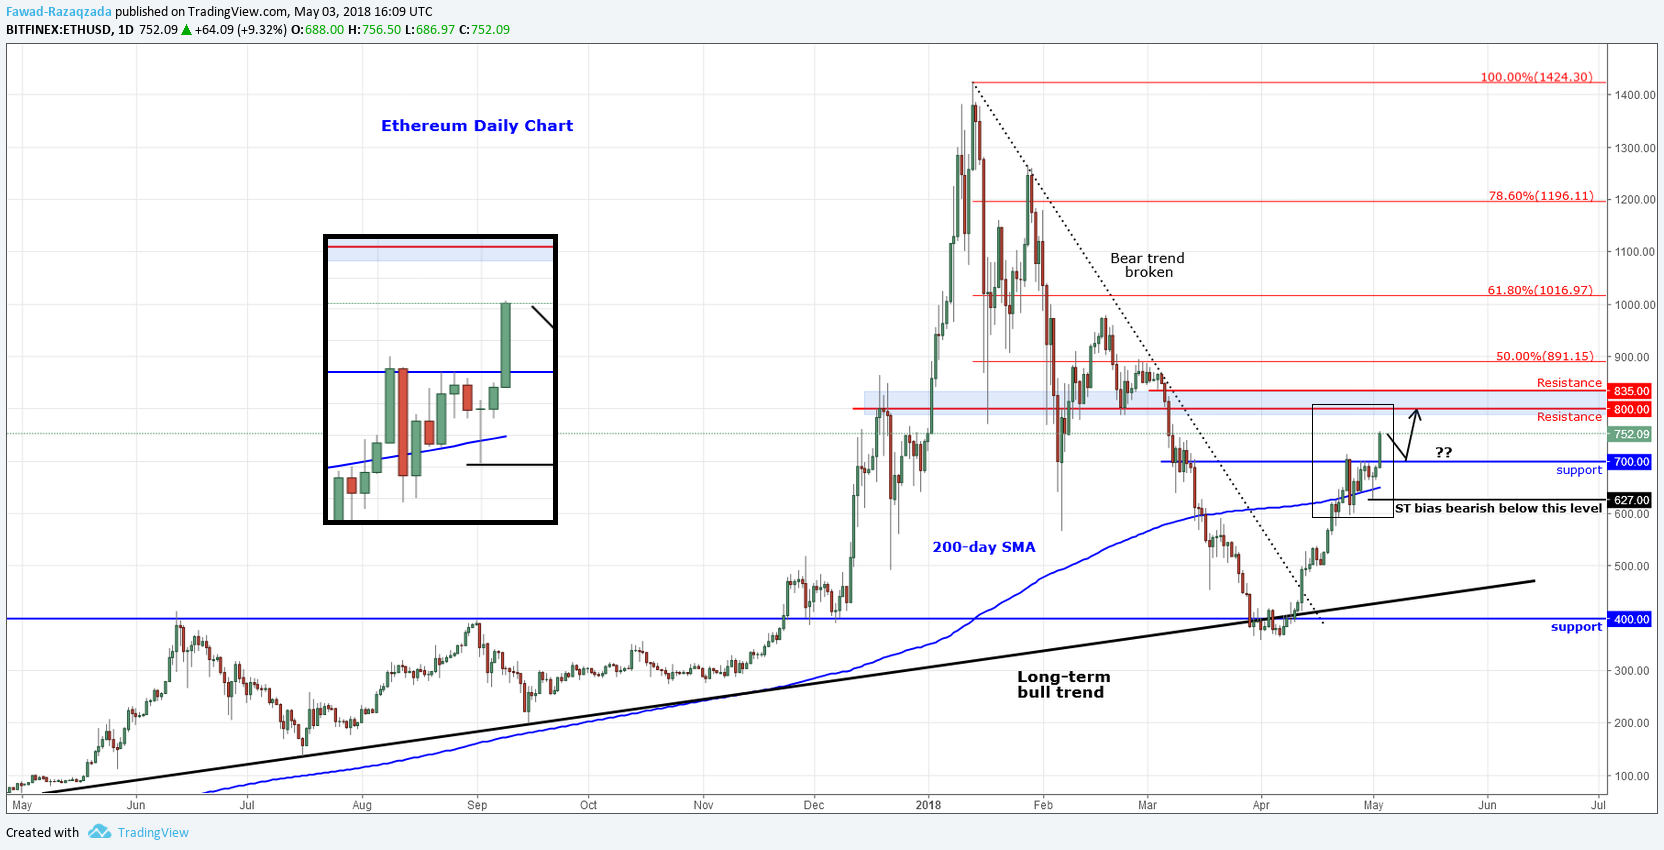 Ethereum leads crypto upsurge as stocks slump